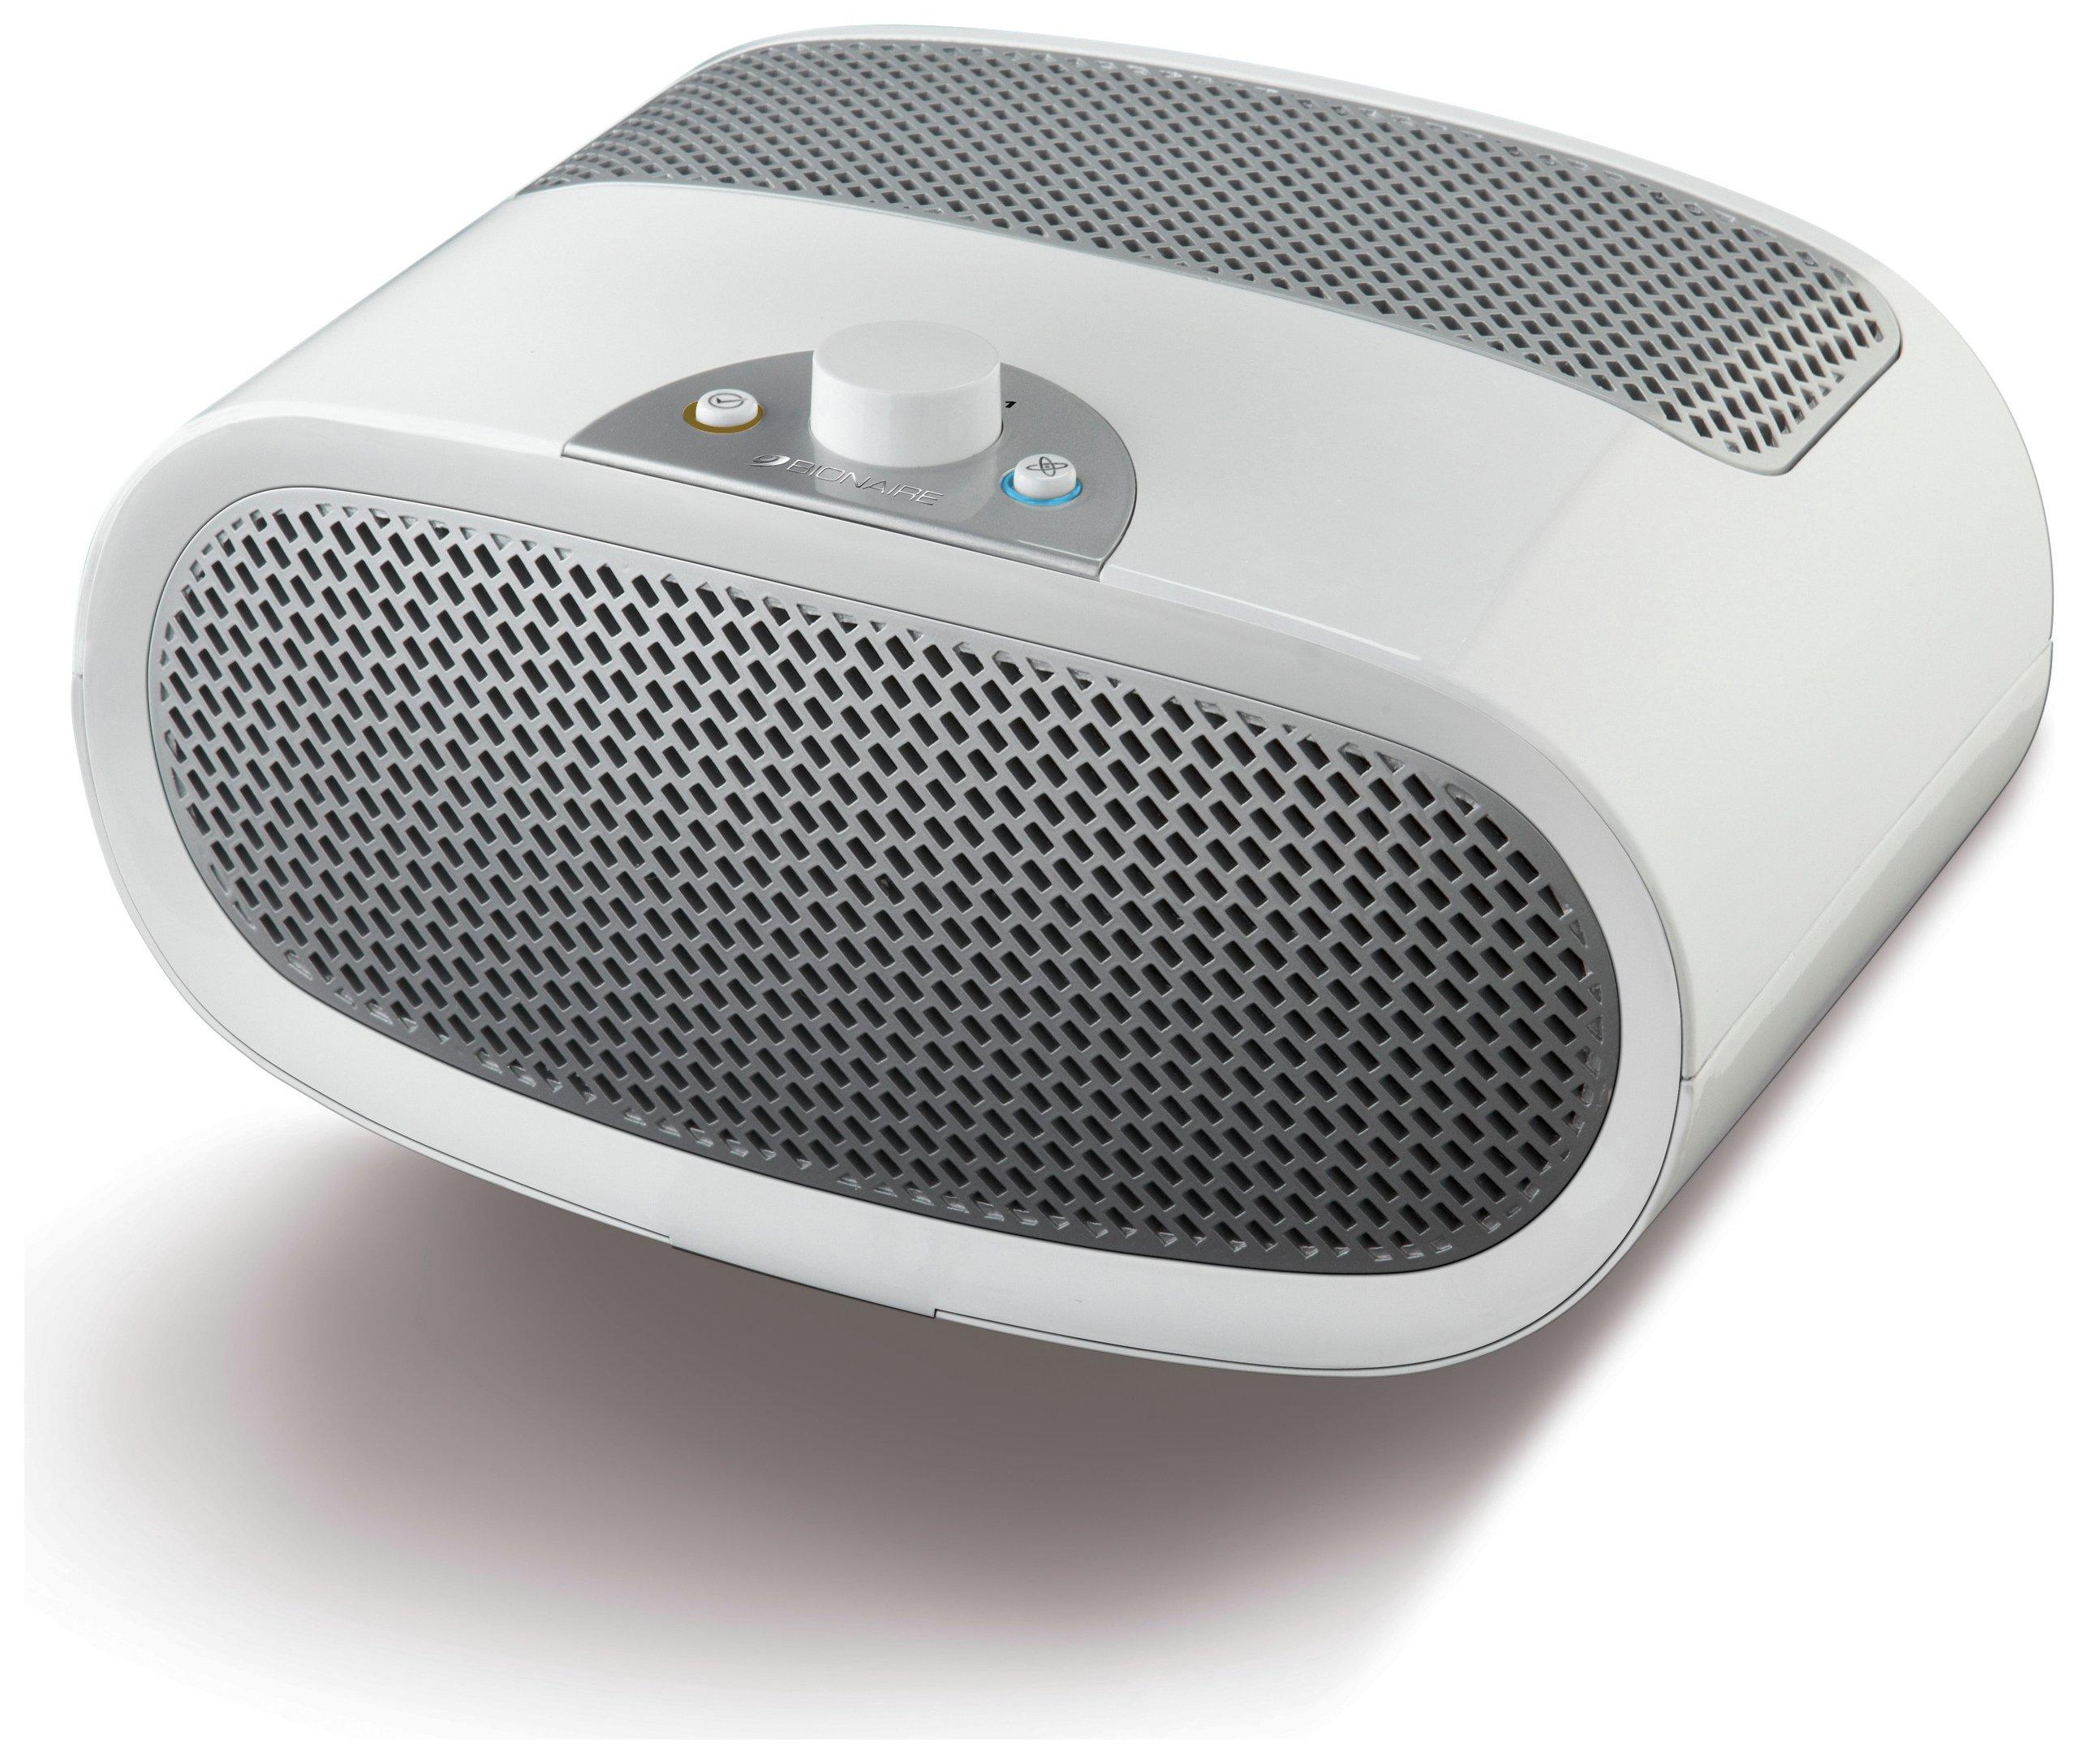 Image of Bionaire - BAP9240 - Air Purifier